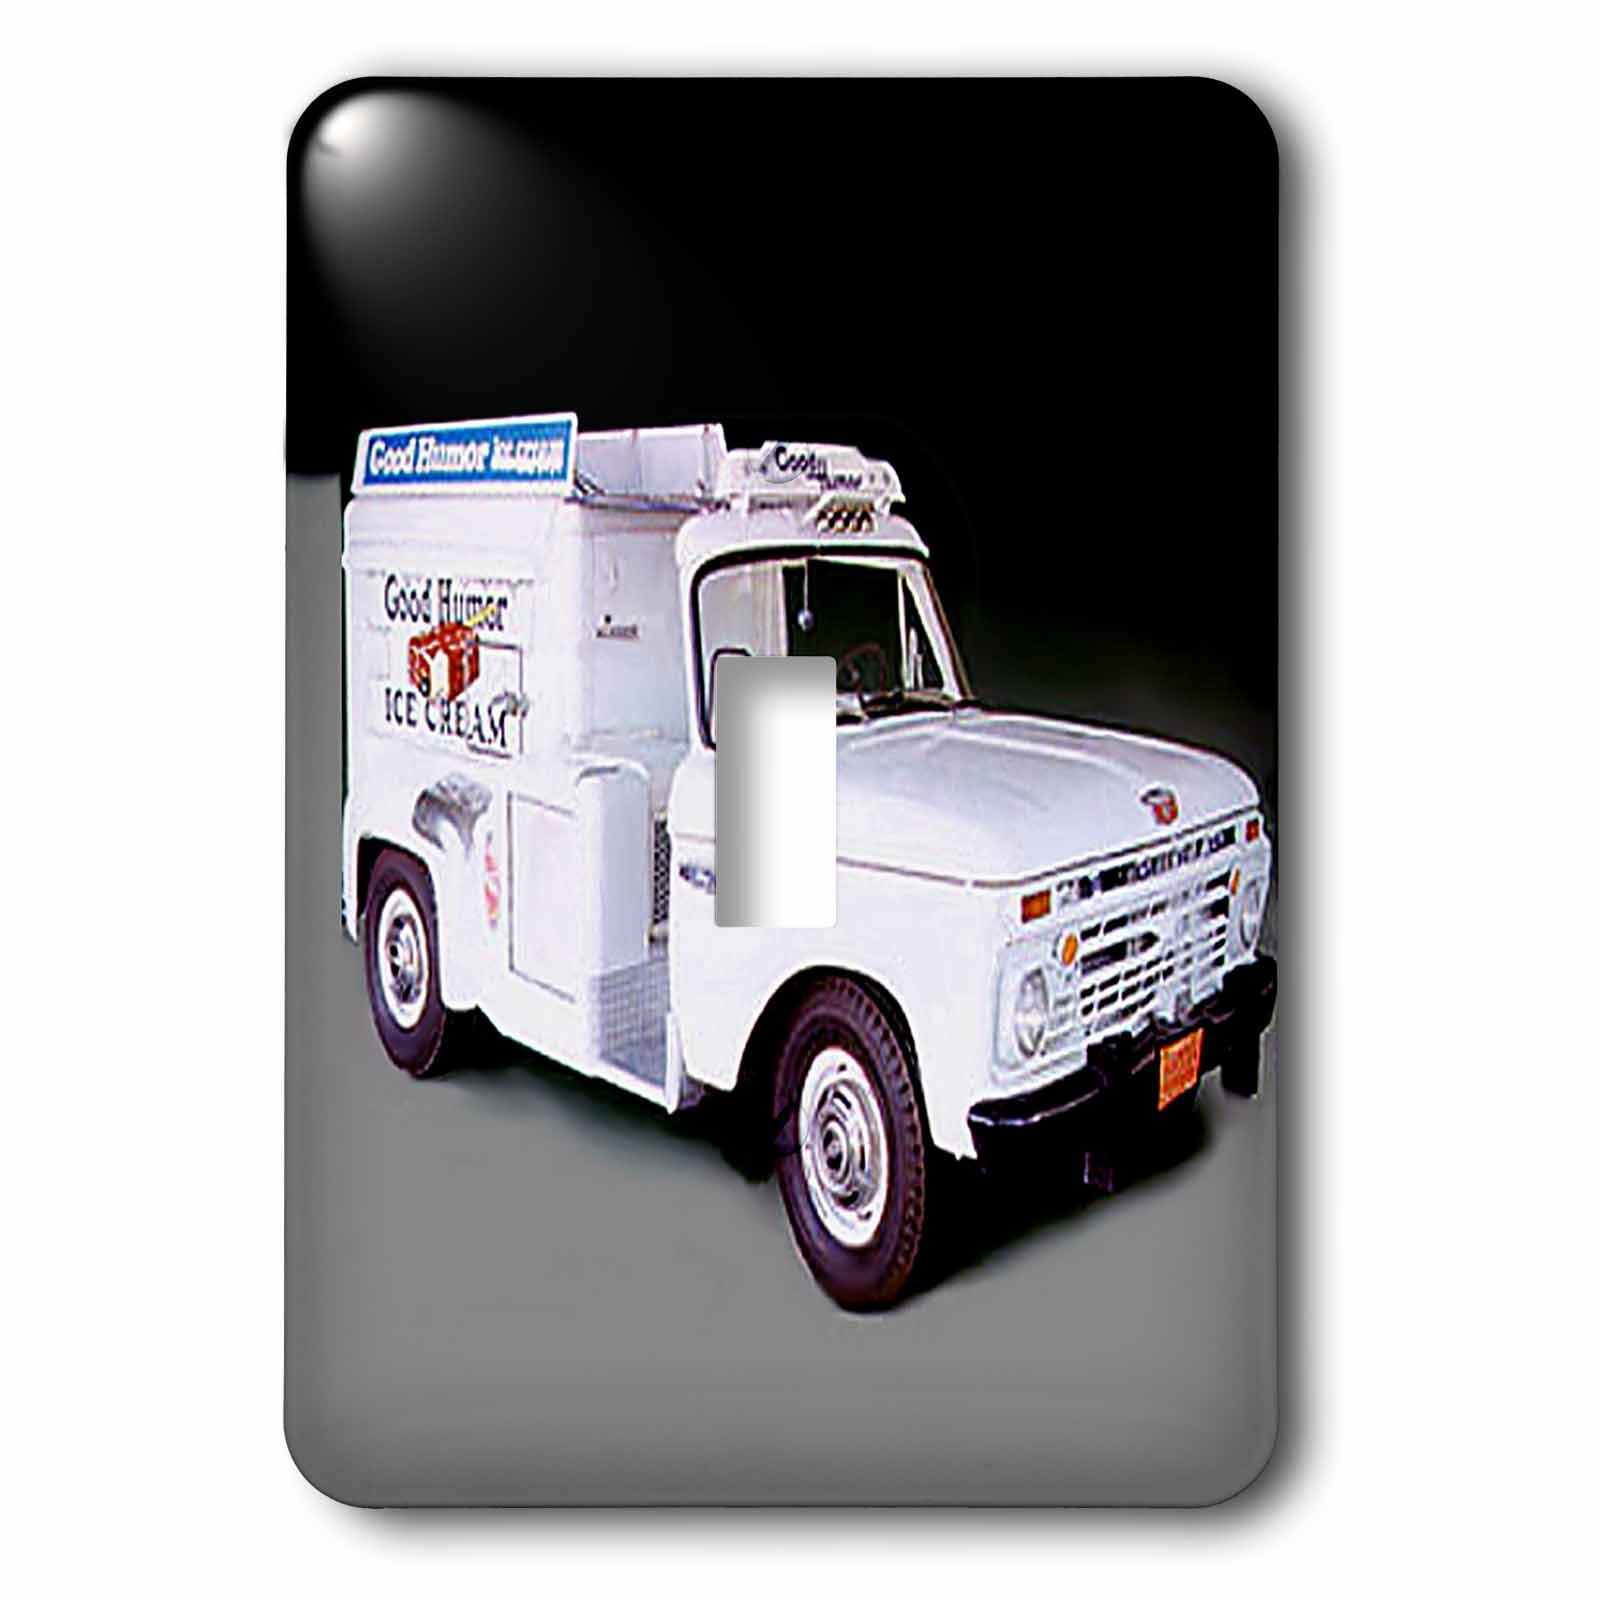 3drose Ice Cream Truck 1 Gang Toggle Light Switch Wall Plate Wayfair